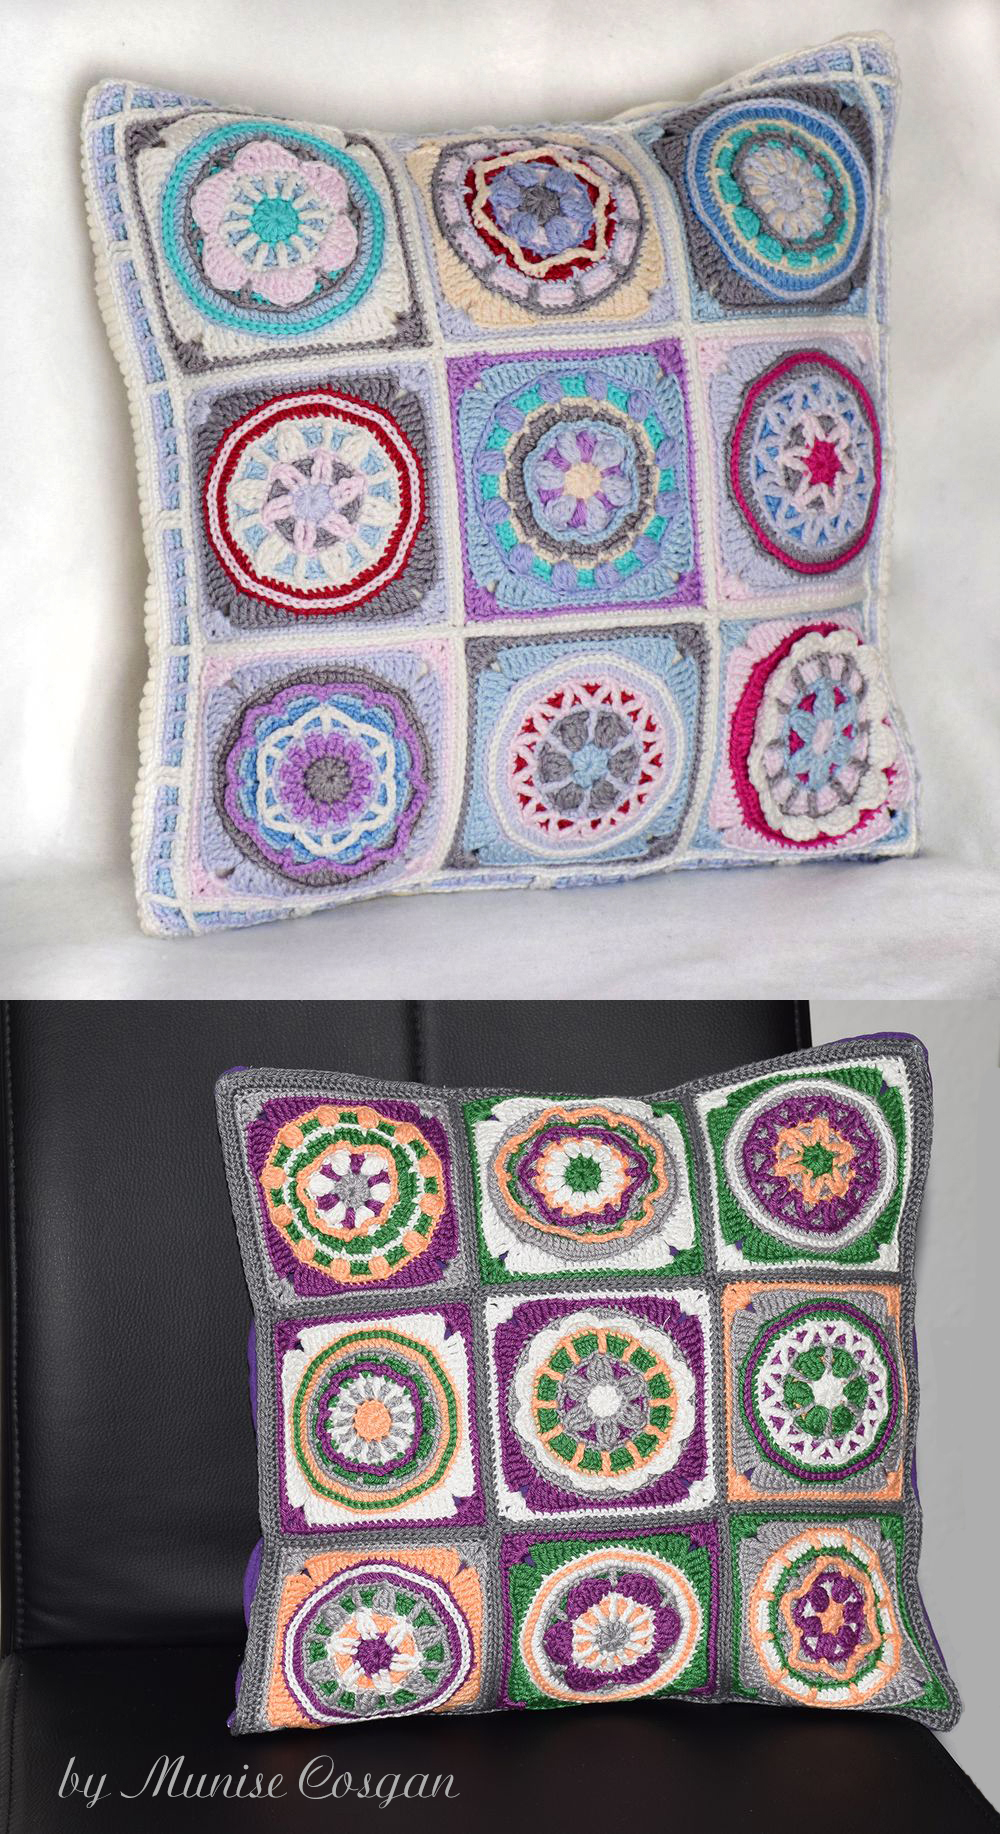 Circles of the Sun pillows by Munise Cosgan